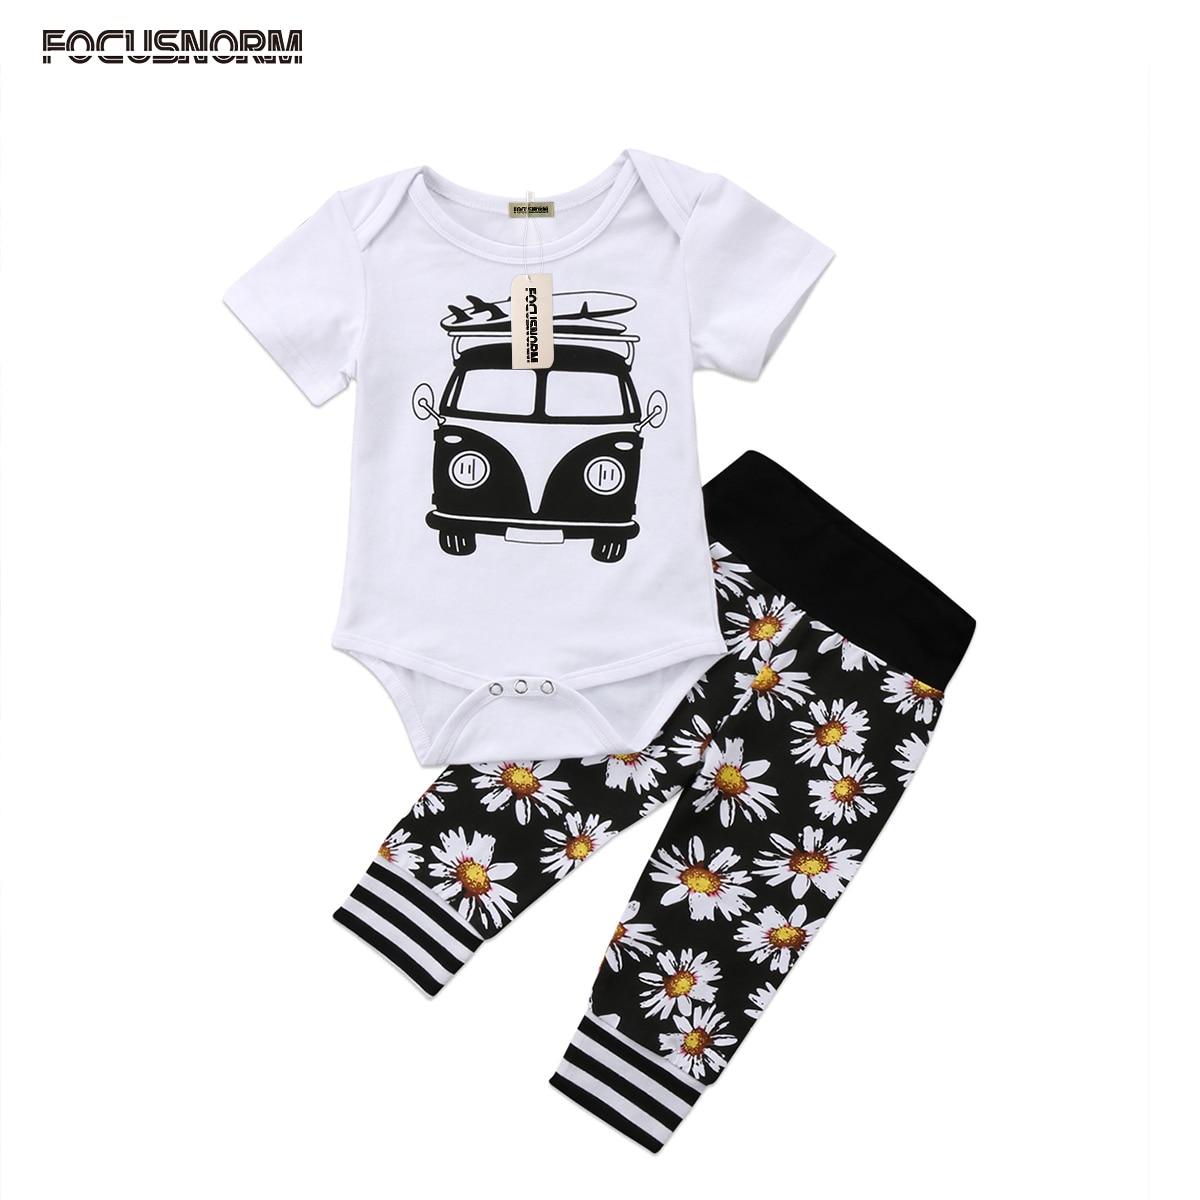 2018 Cute Newborn Baby Boys Girls Top Short Sleeve Car Print Romper Floral Long Pants Outfits Set Sunflower 2pcs Clothes